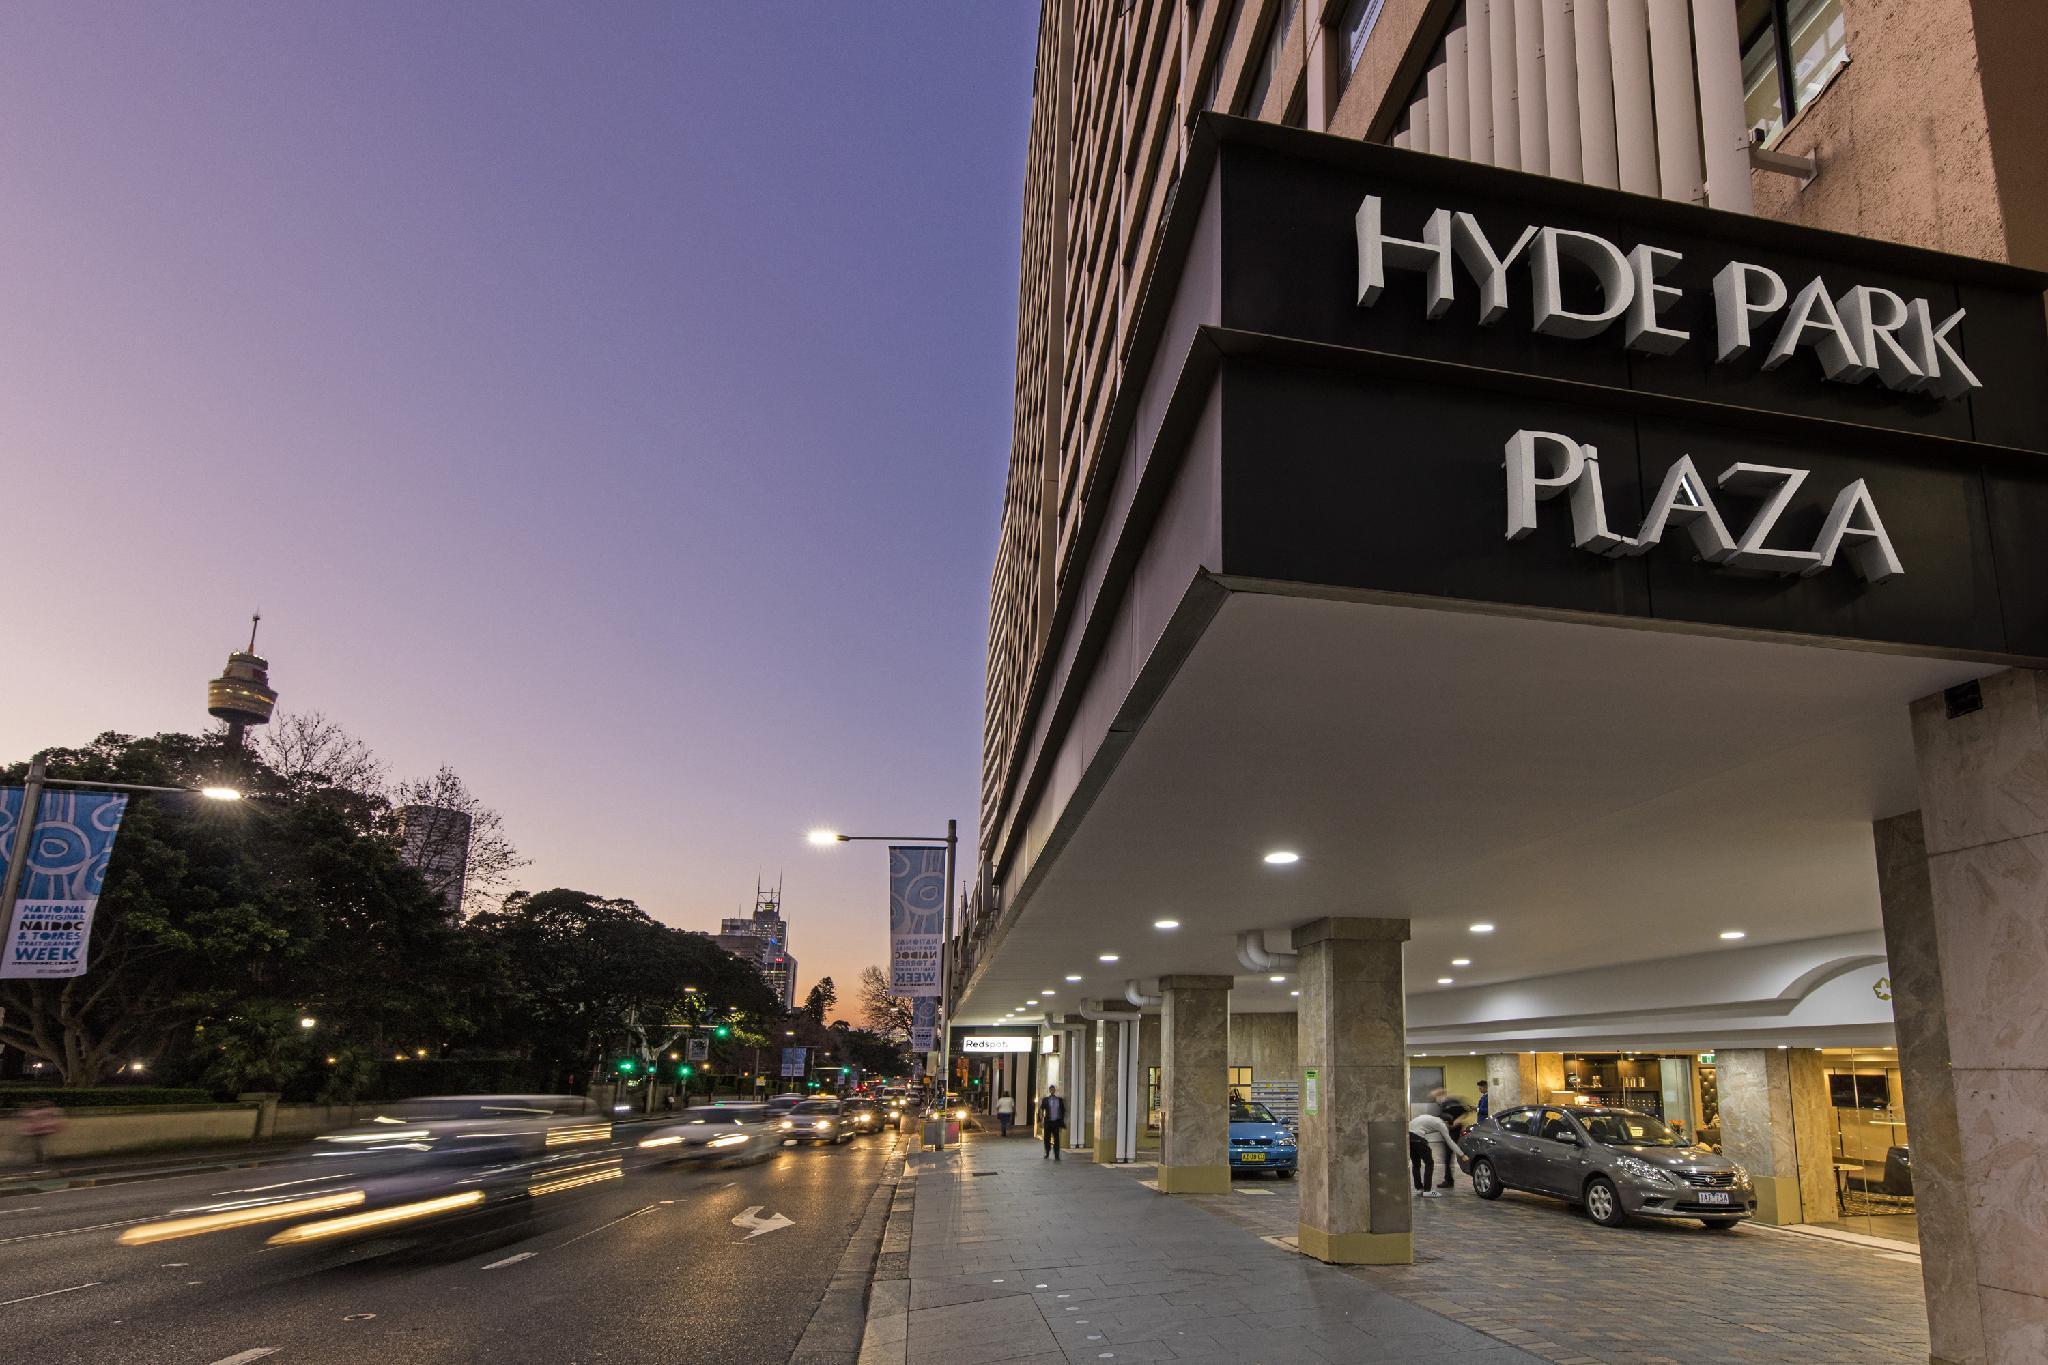 Oaks Hyde Park Plaza Hotel